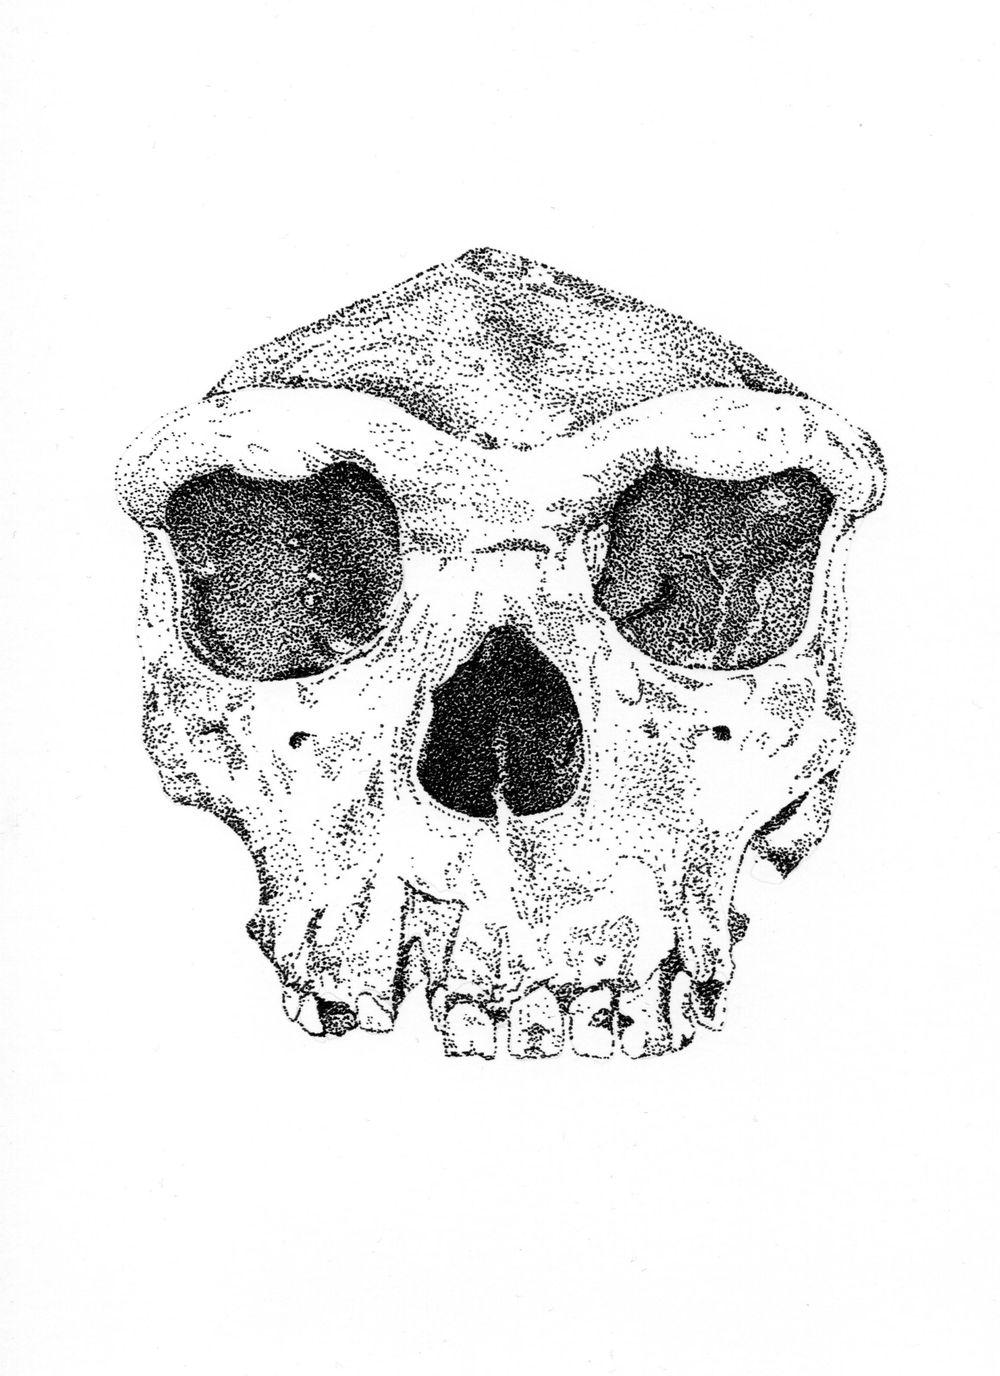 Homo heidelbergensis - image 1 - student project